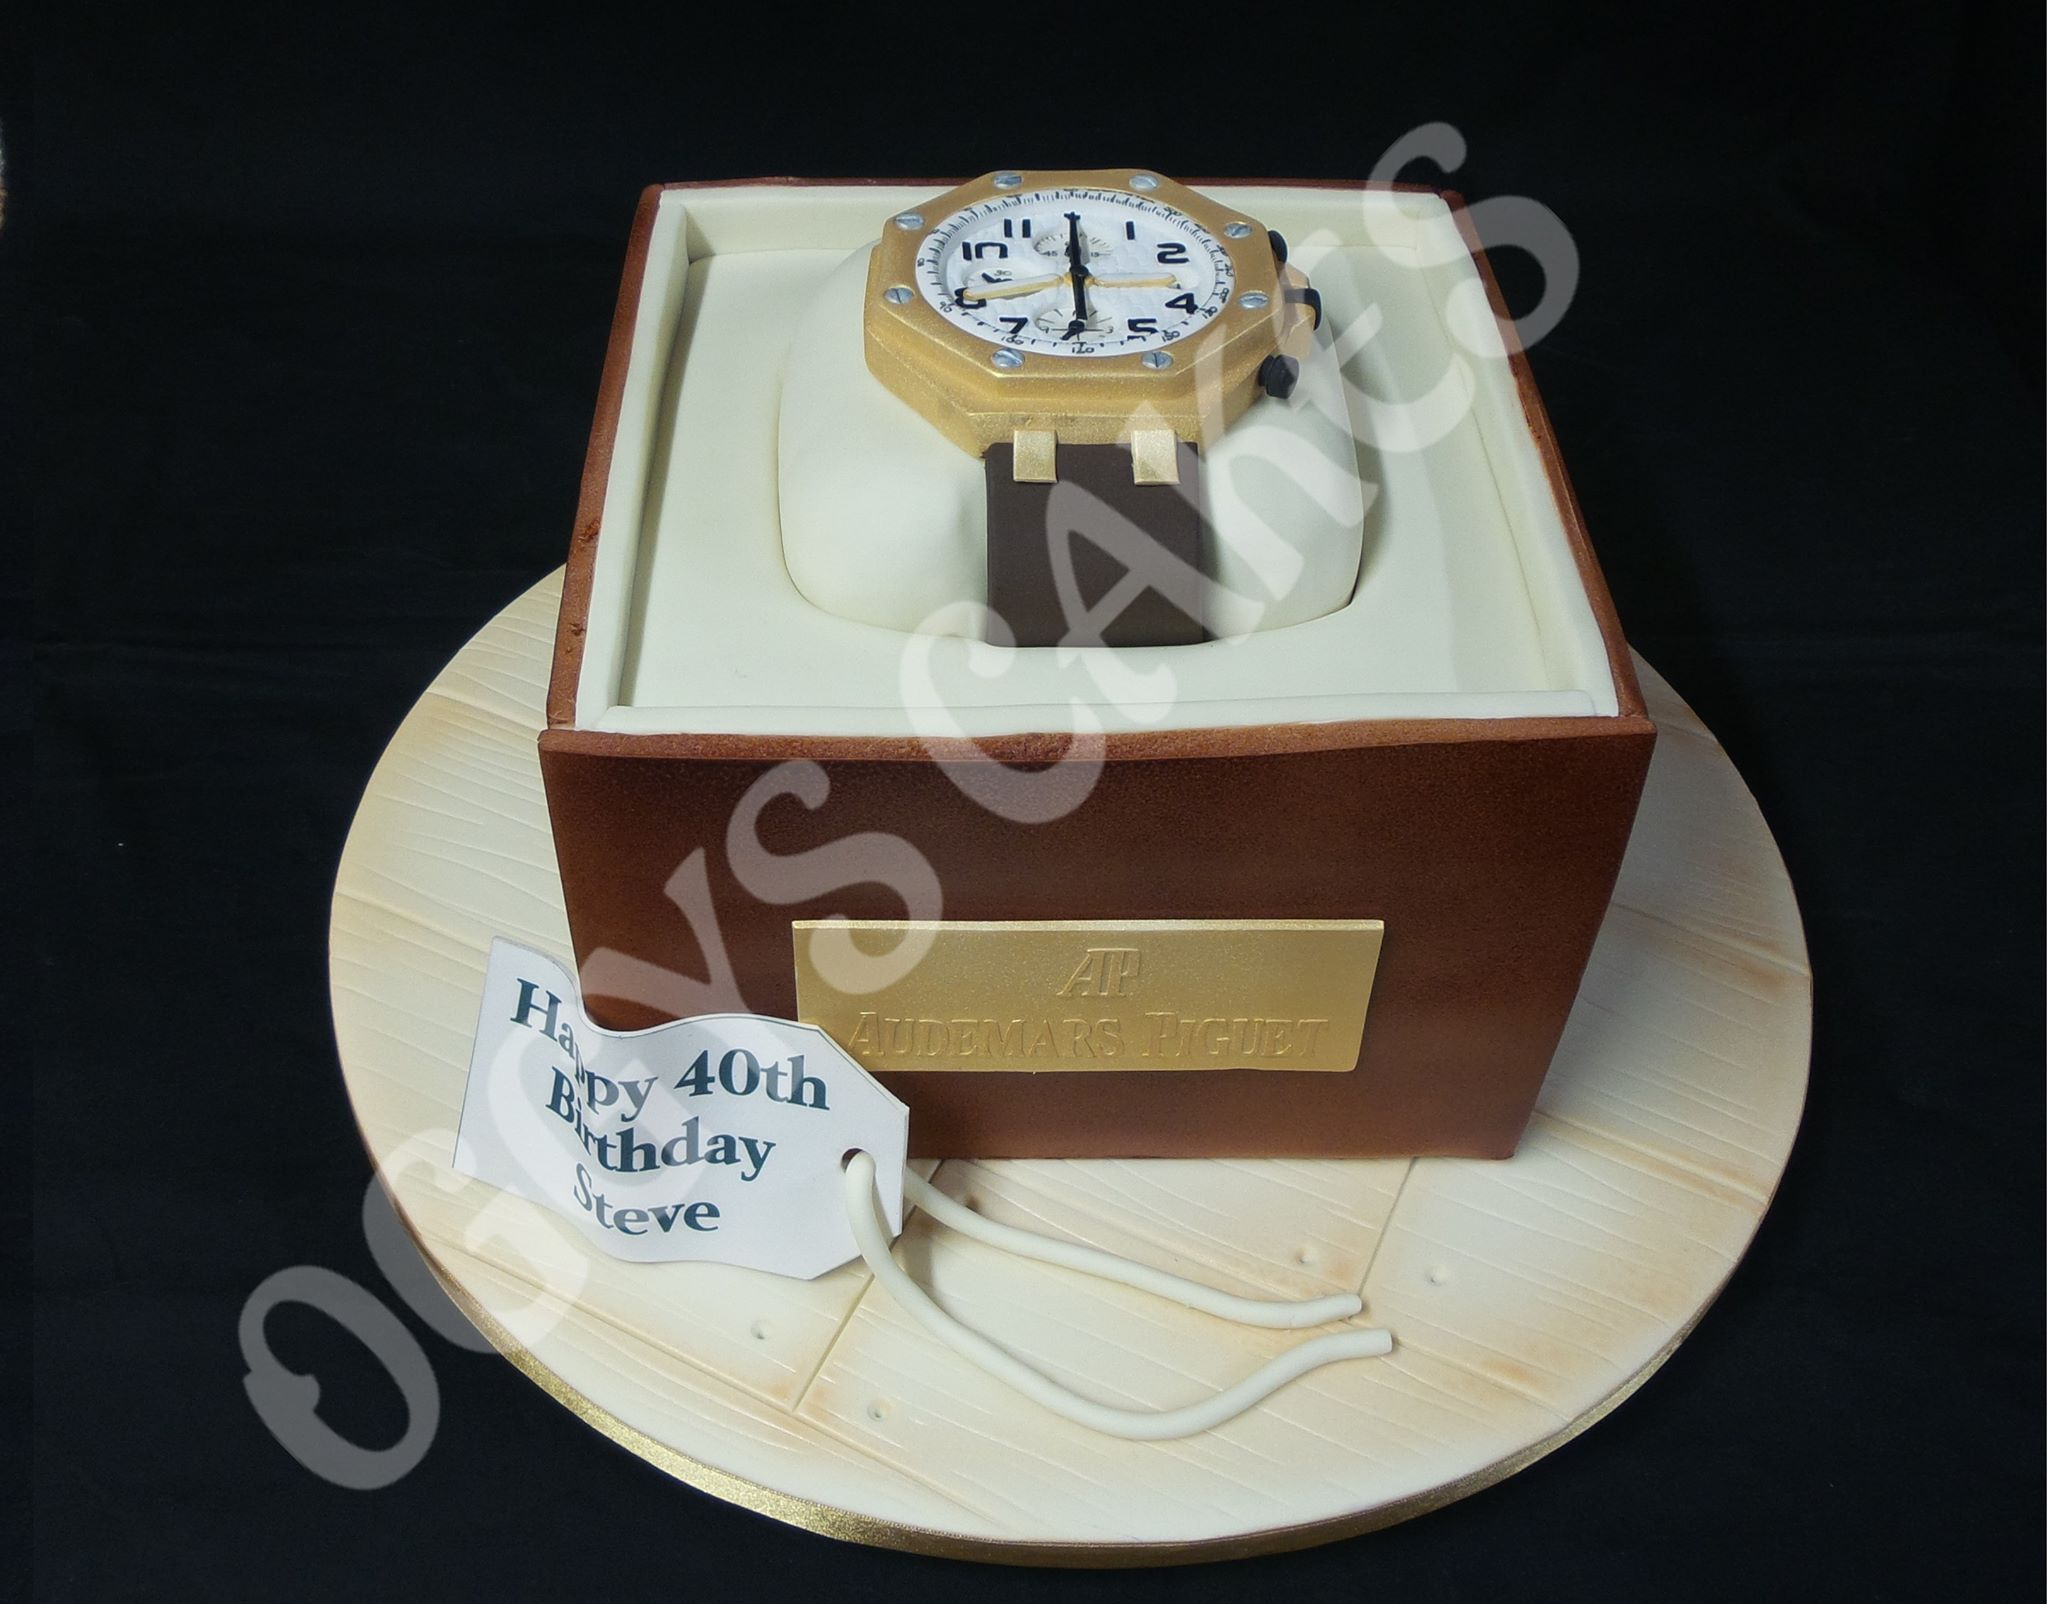 Bartsharp 180 Airbrush Oggys Cakes - Wrist Watch